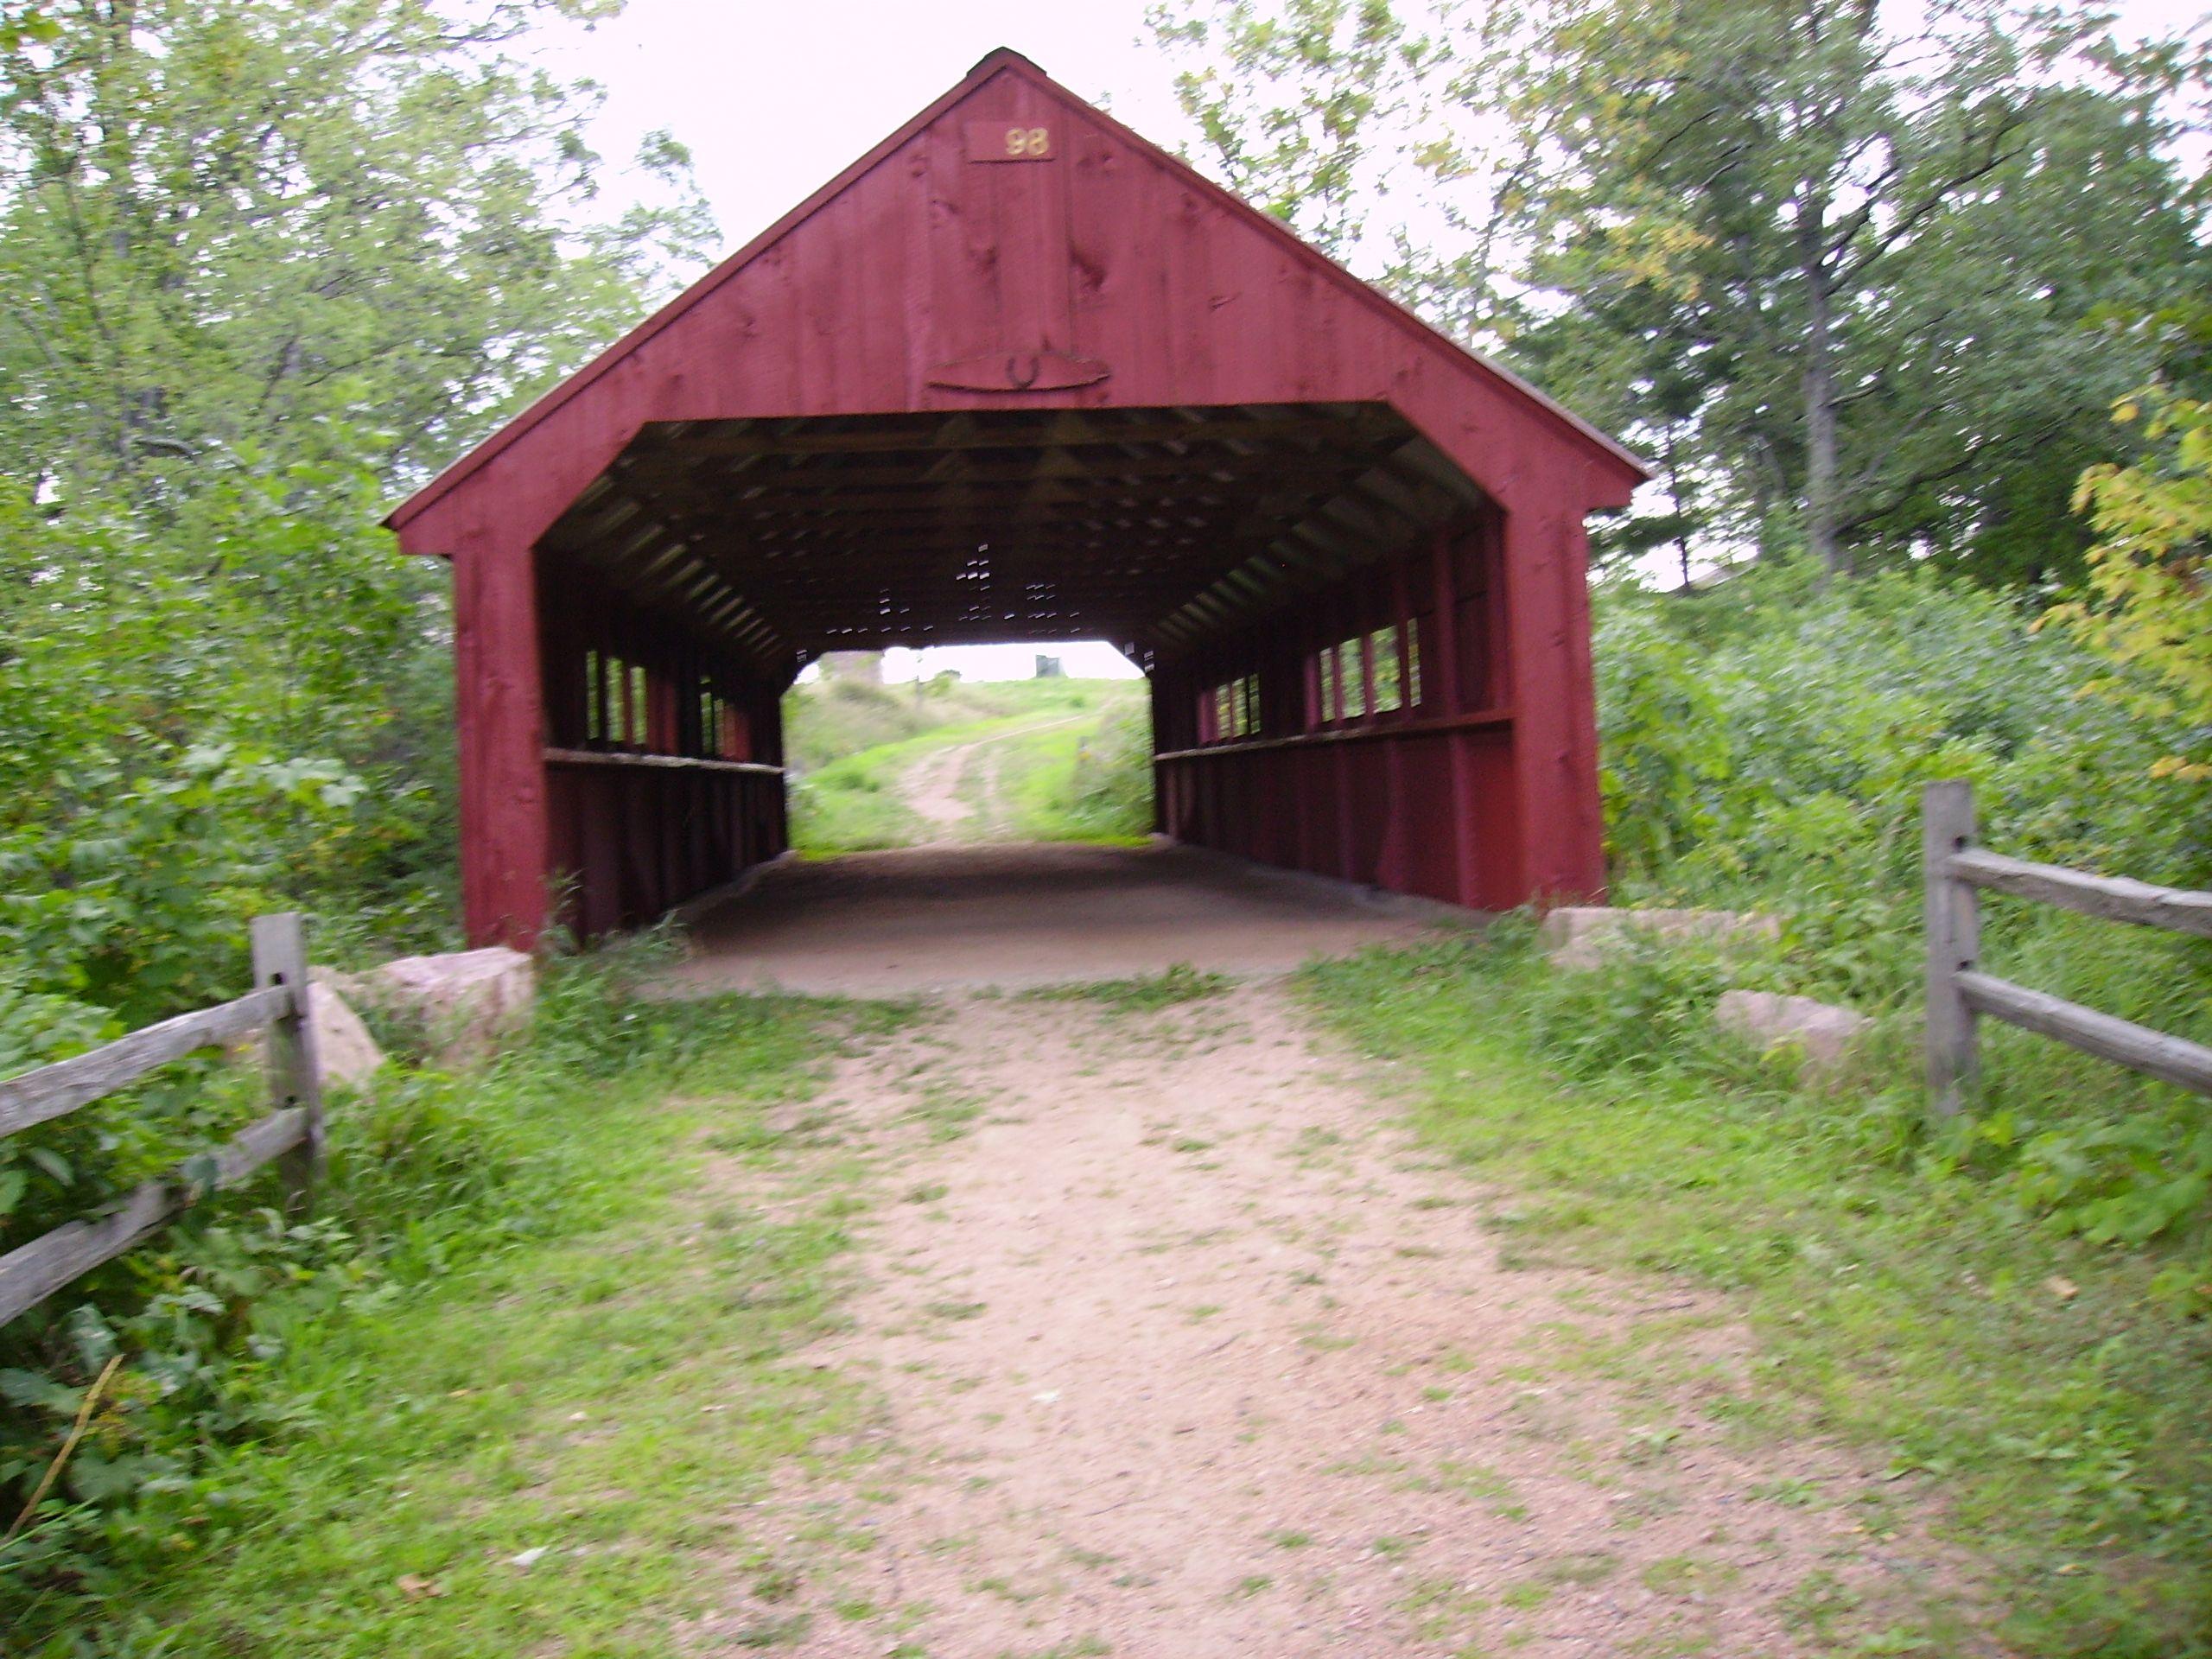 Wausau Wisconsin Old Covered Bridge By The Cedar Creek Mall In Wausau Wi Wisconsin